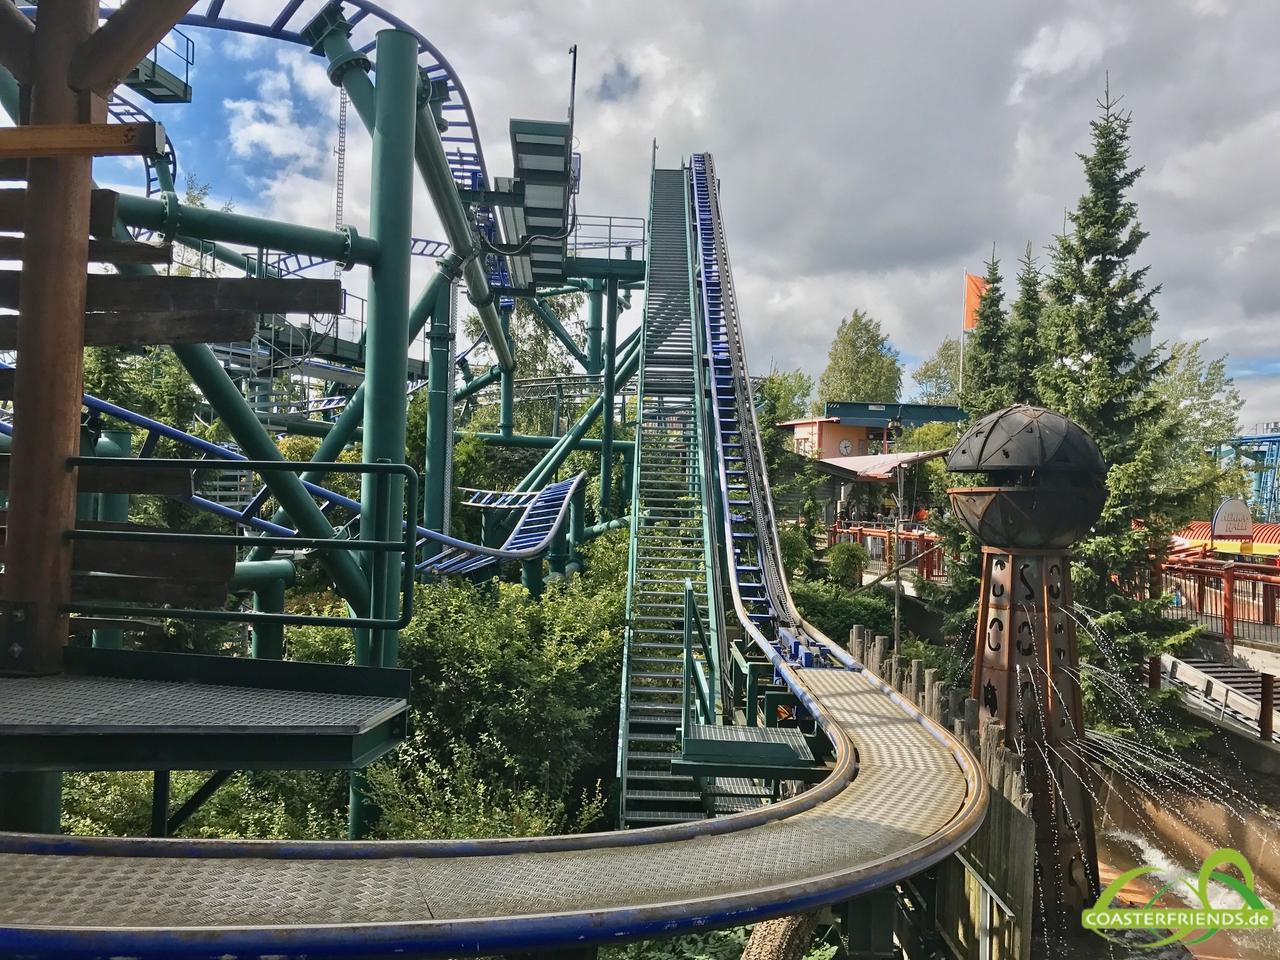 Europa - https://coasterfriends.de/joomla//images/pcp_parkdetails/europa/o1639_Linnanmaki/content2.jpg